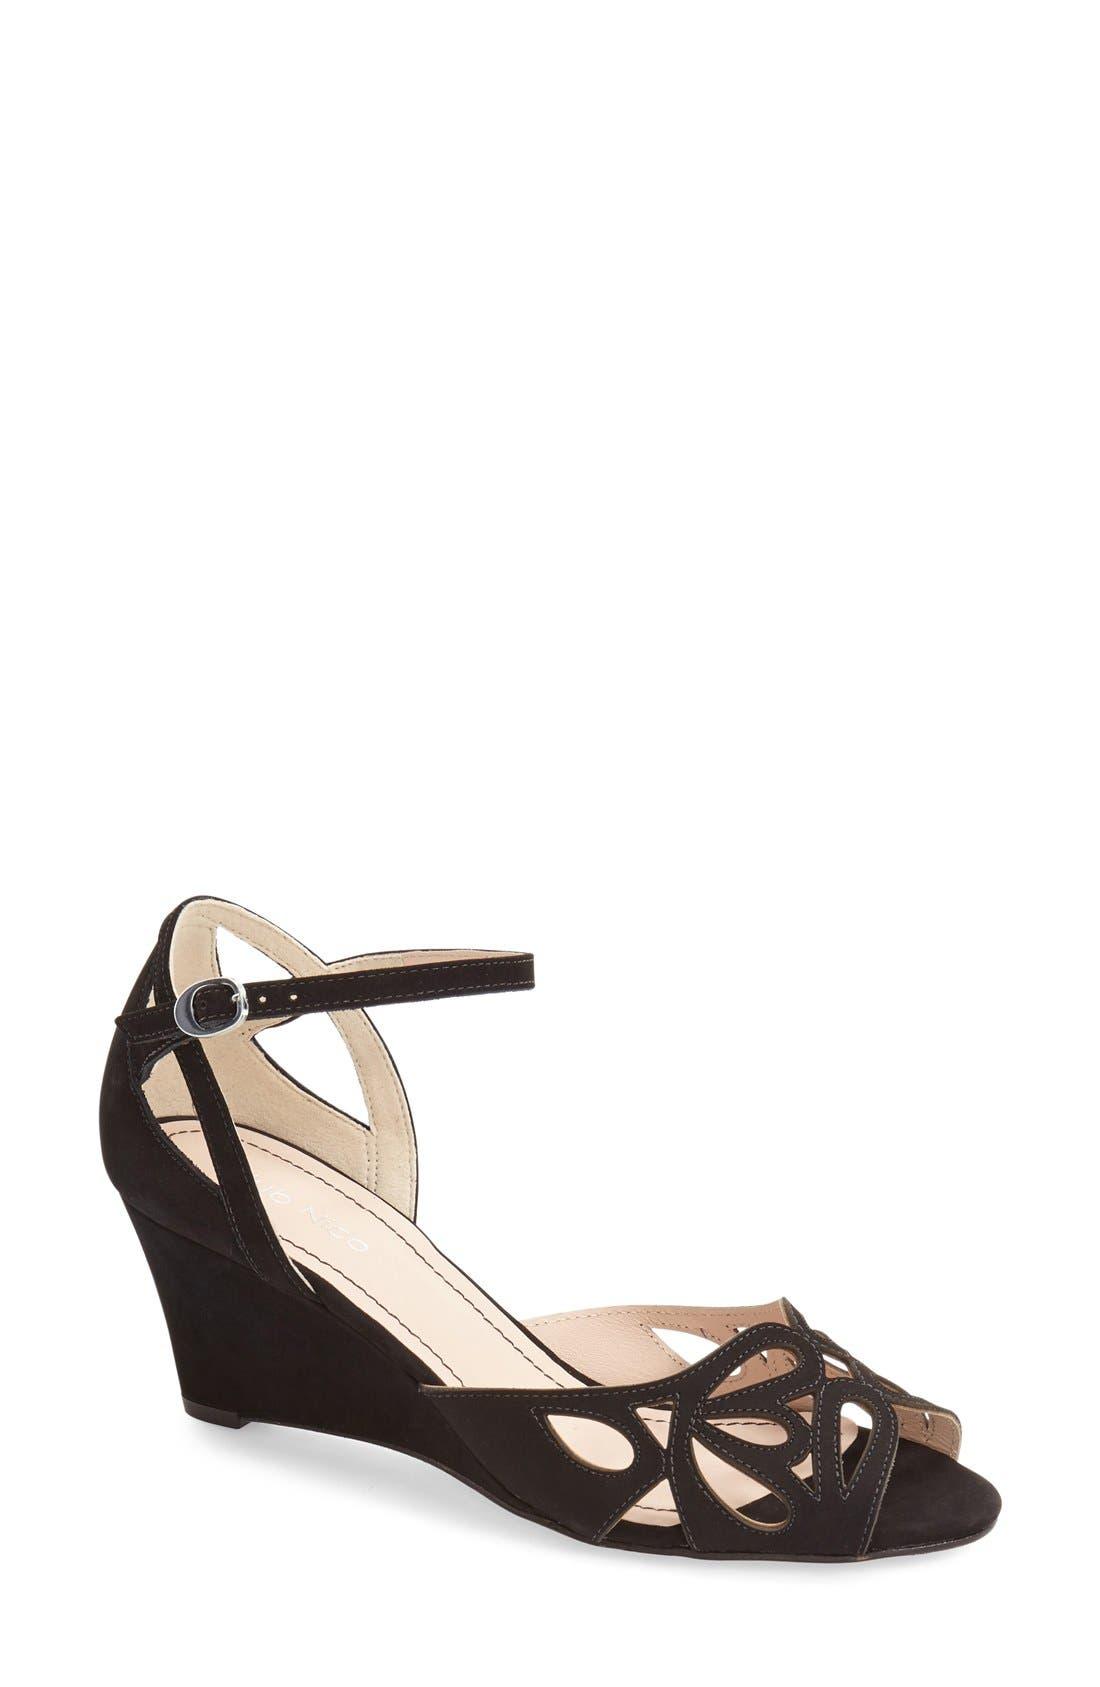 'Kismet' Wedge Sandal,                         Main,                         color, Black